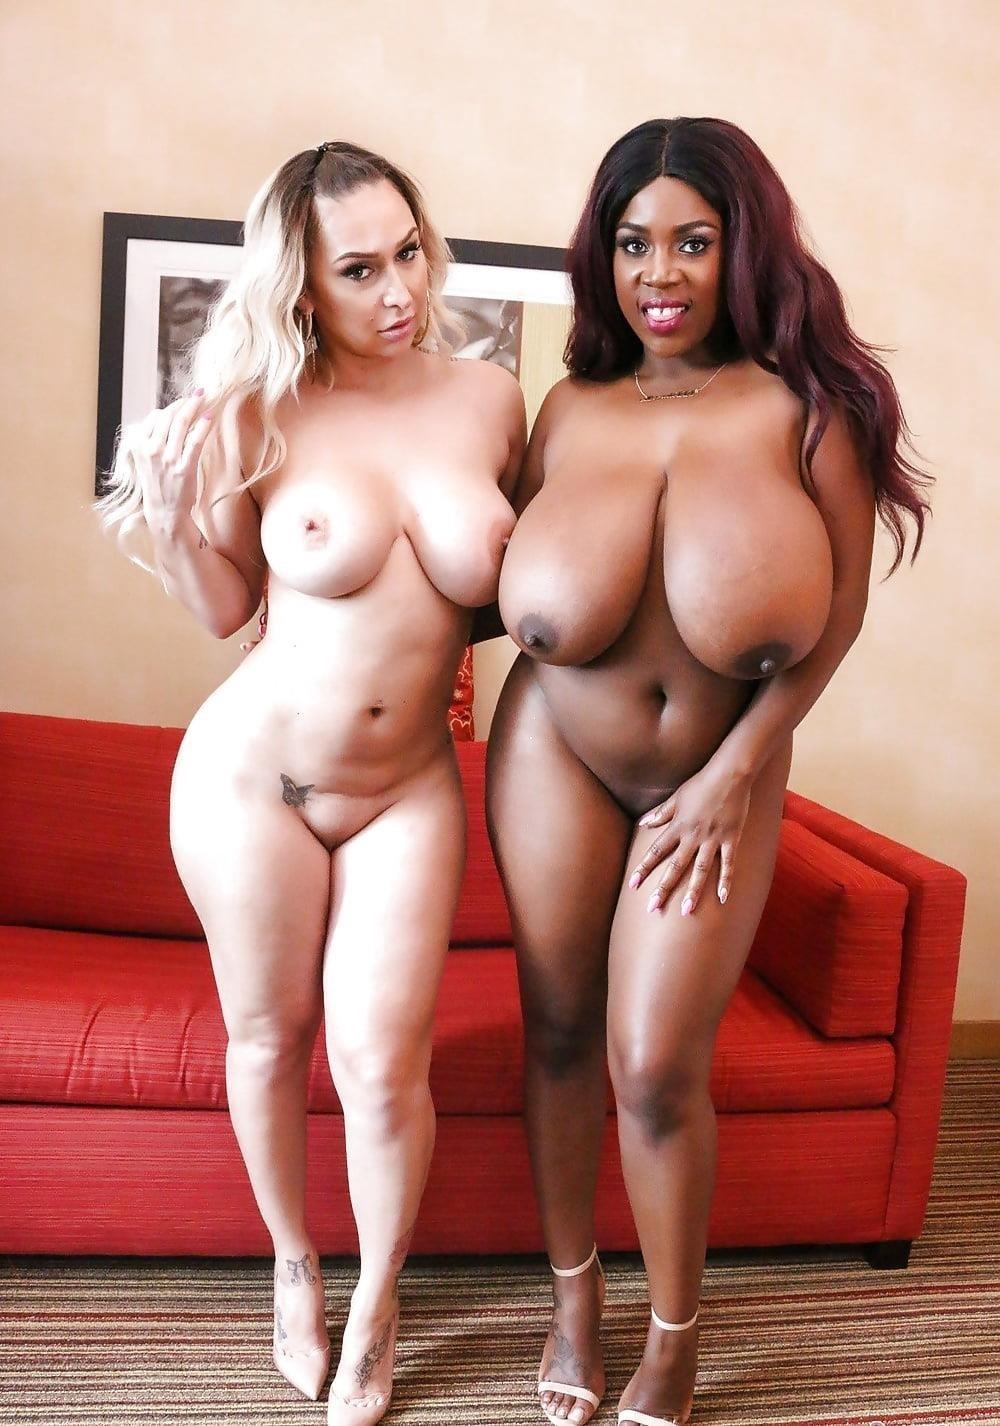 Curvy lesbian pics-4673